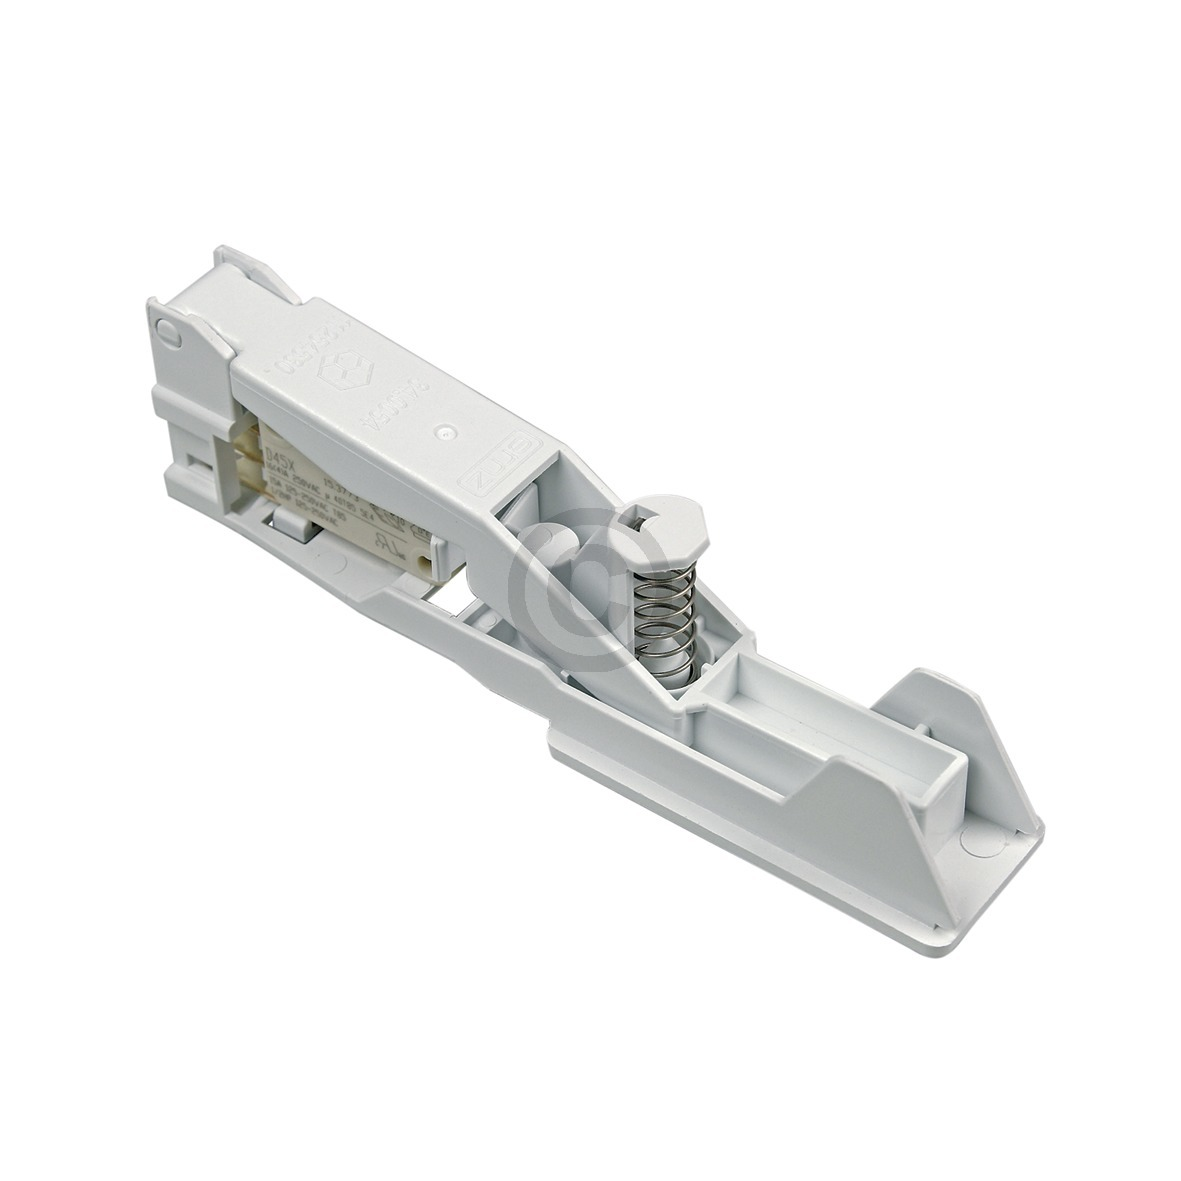 Türschalter EMZ 112545300